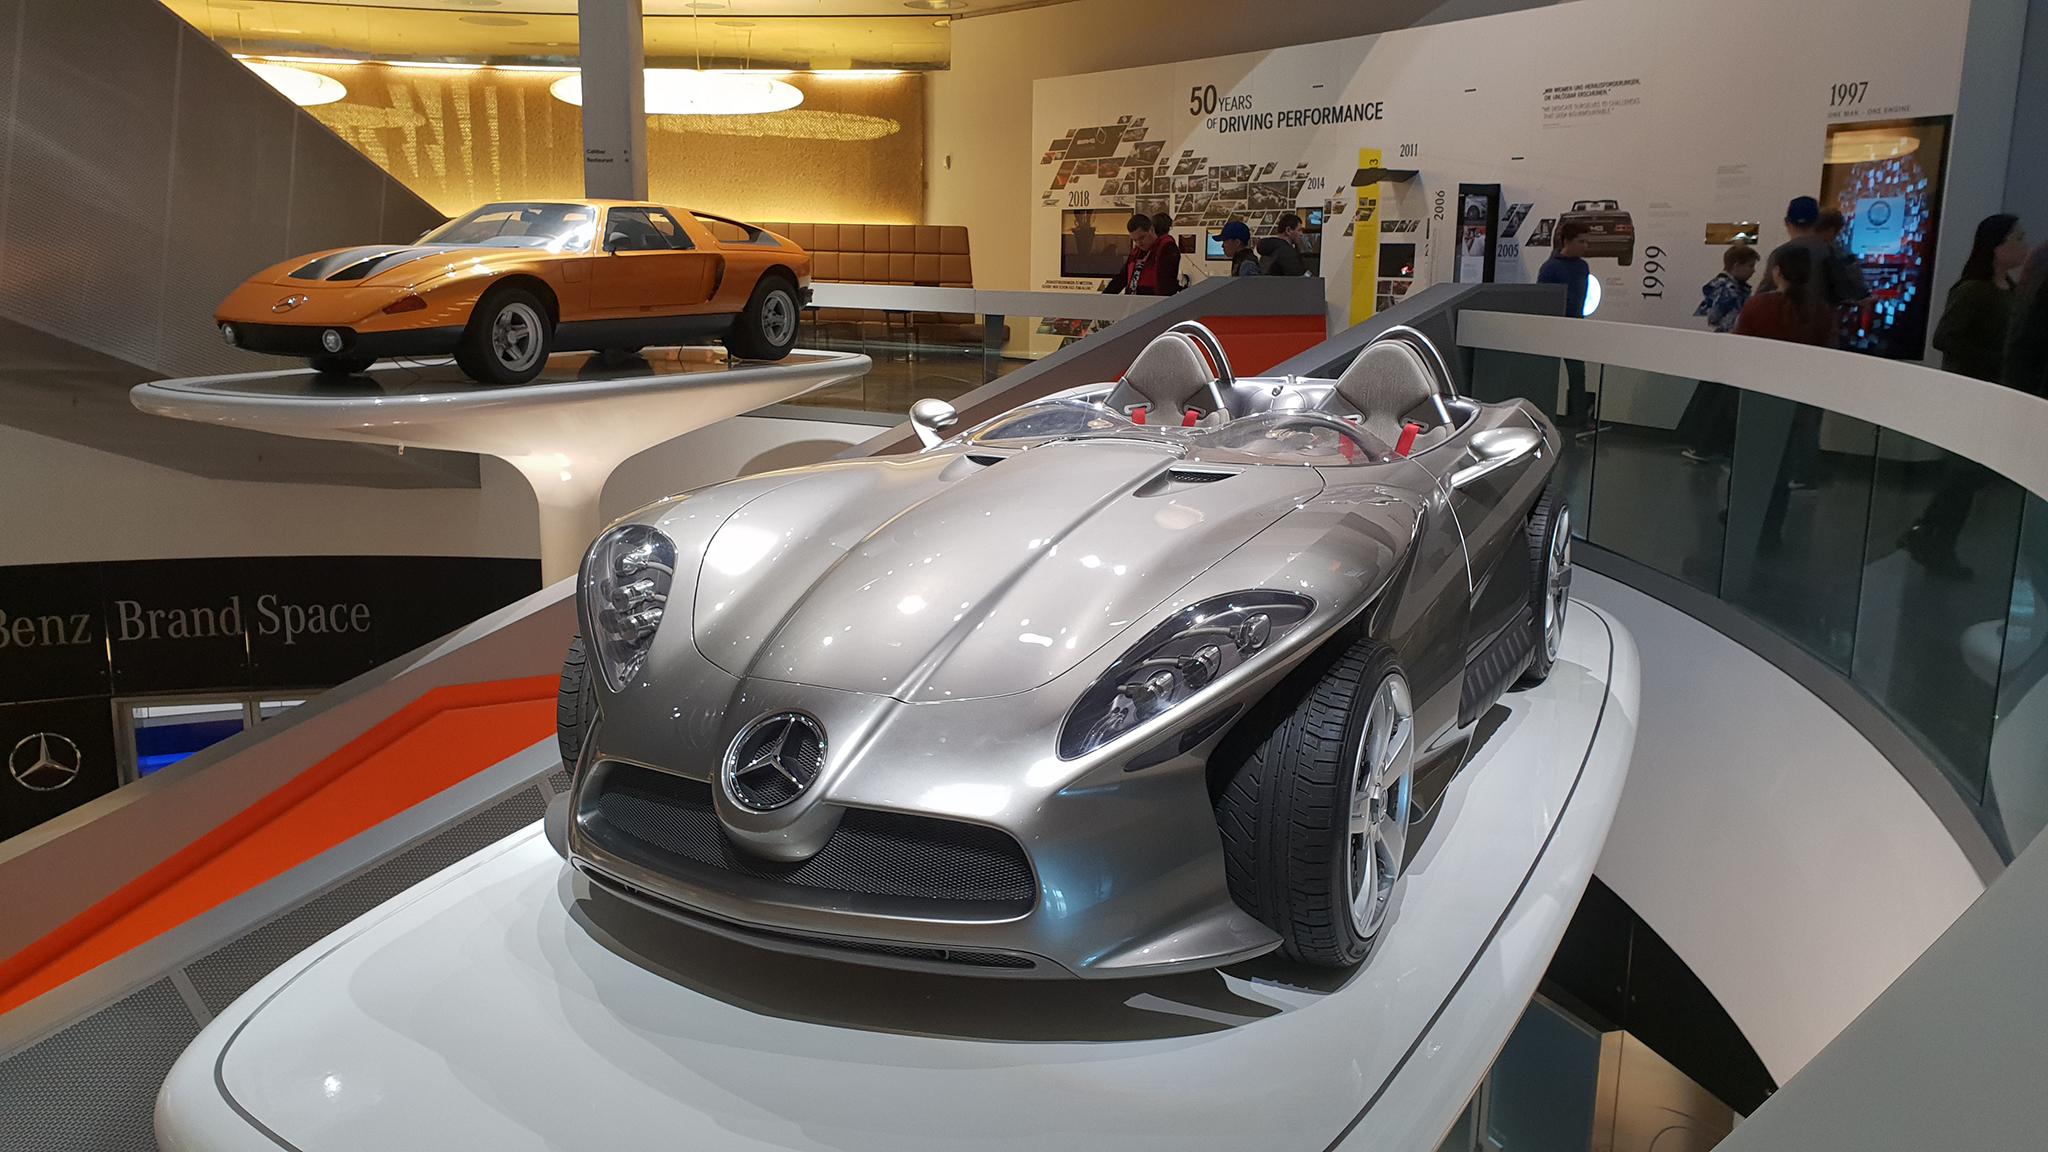 S9-Mercedes-Benz Museum-tinhte-39.jpg